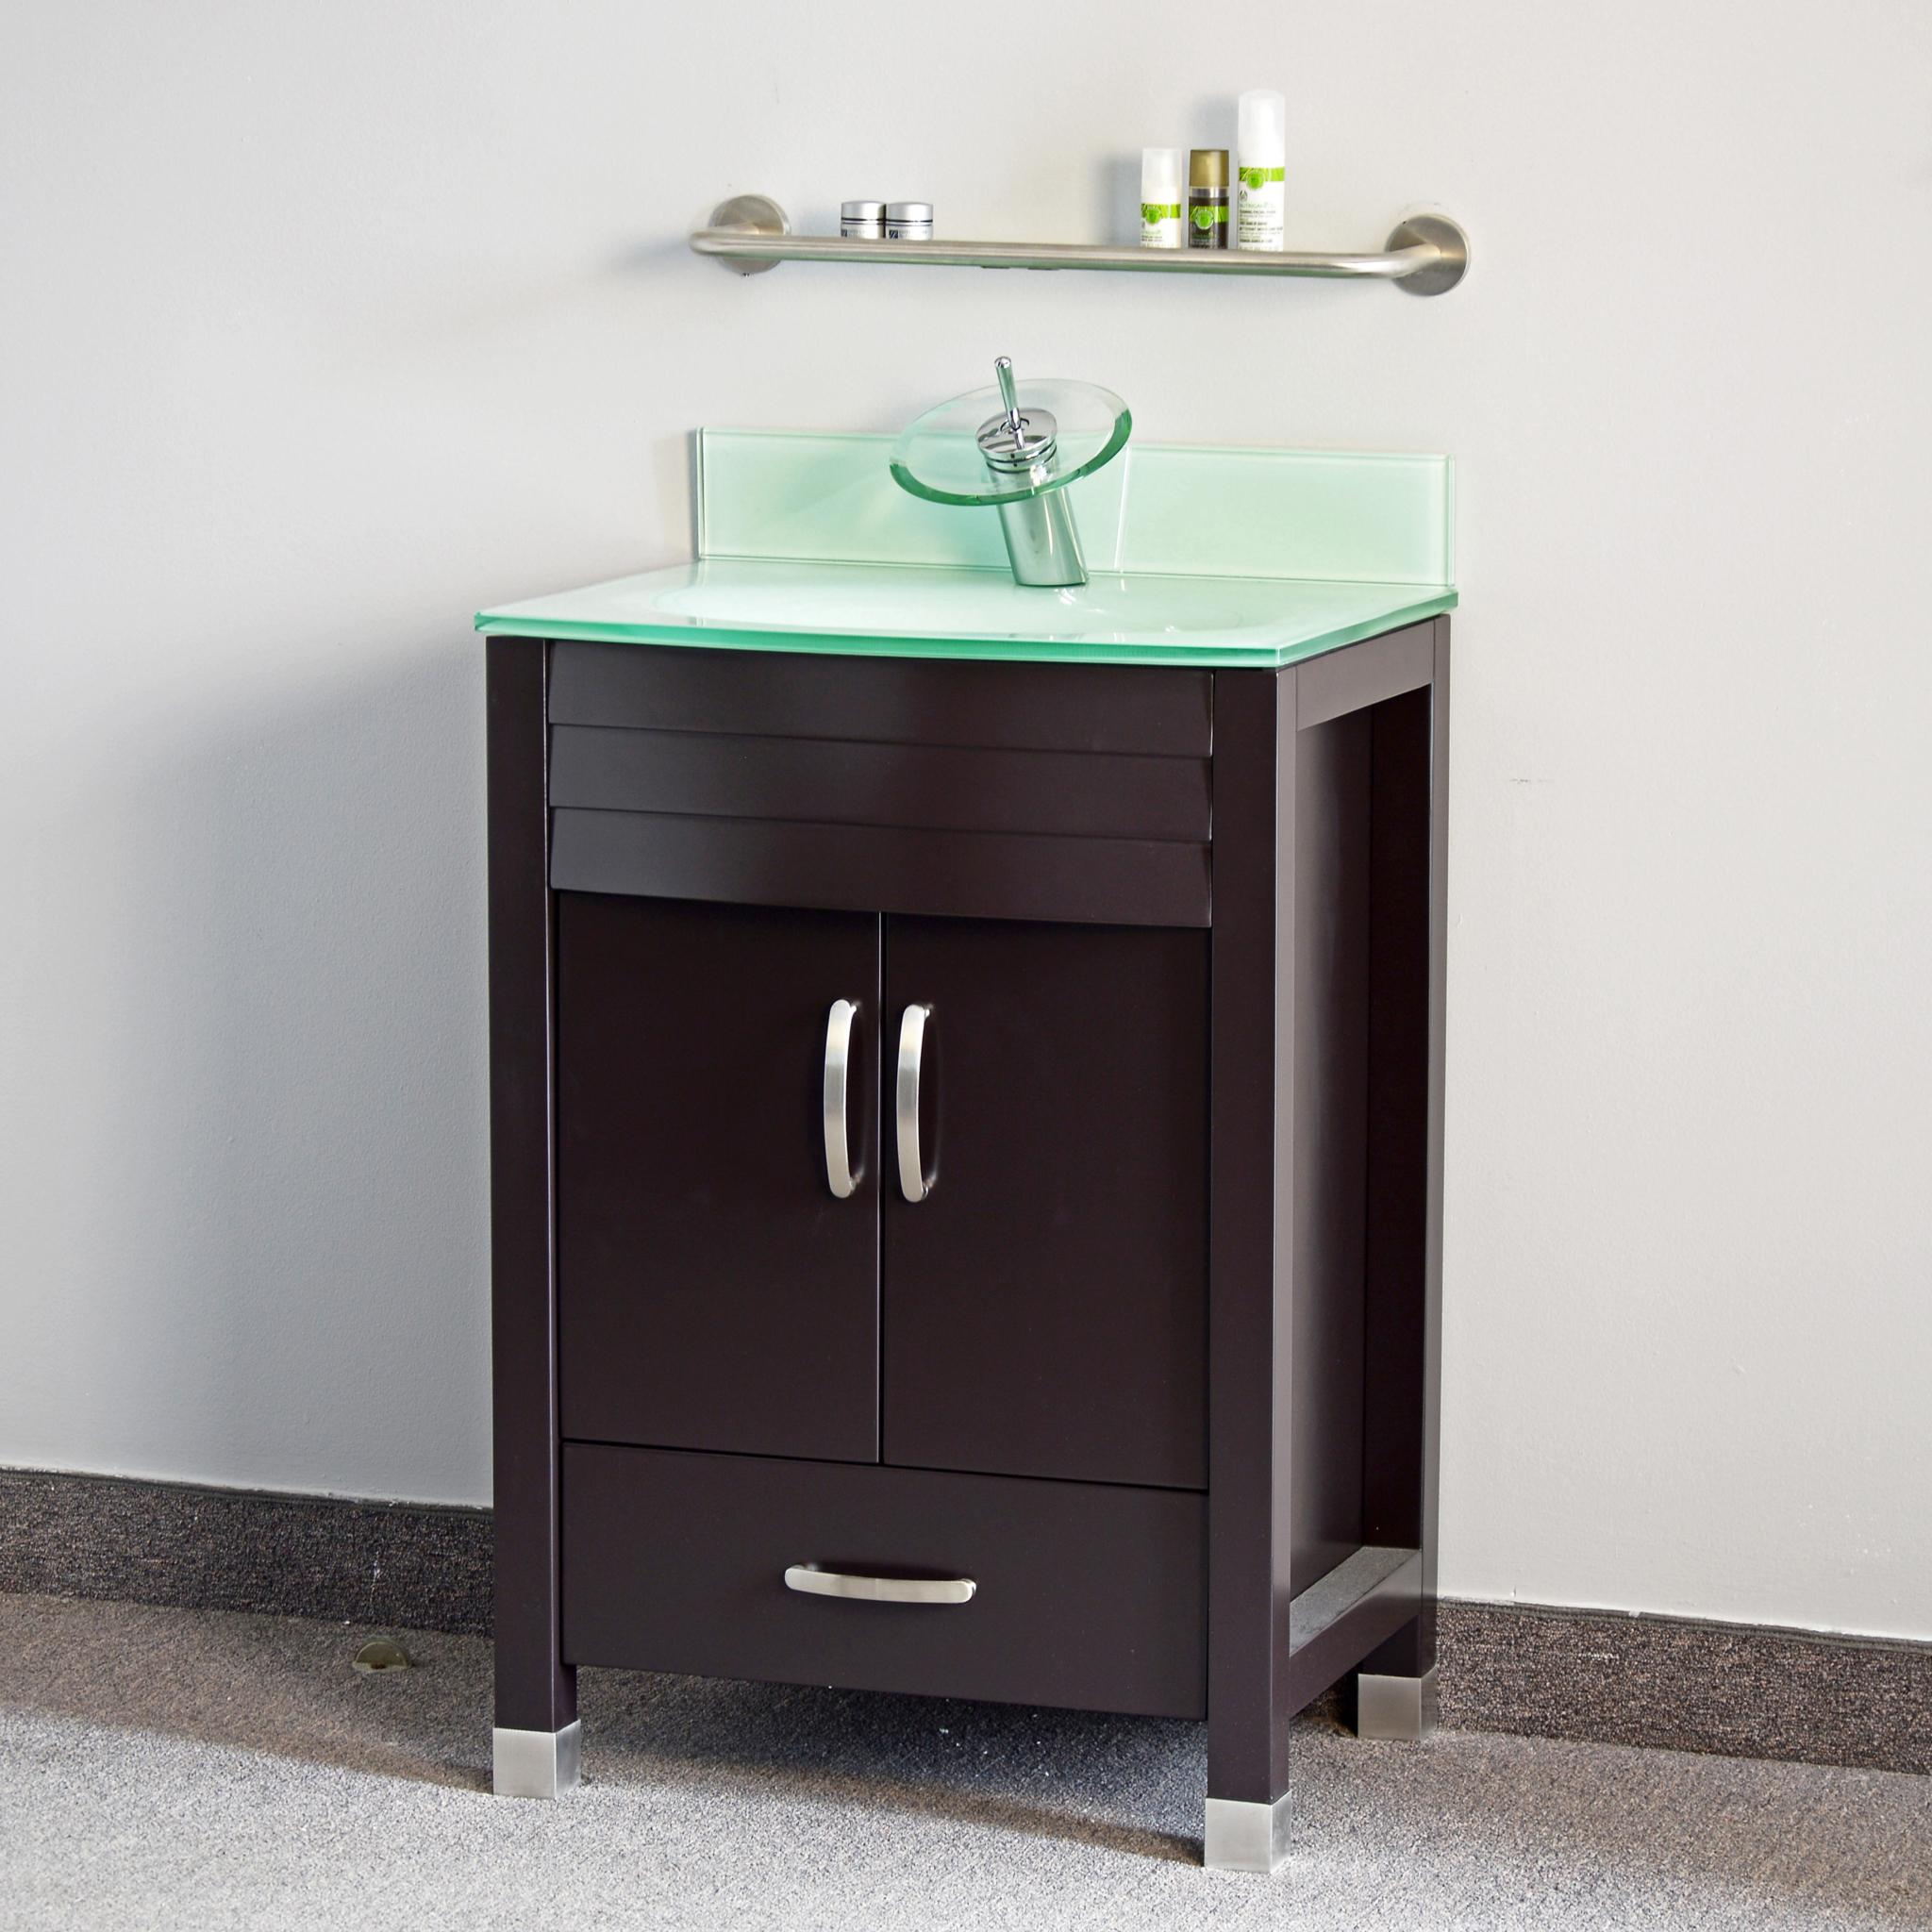 Mirrored Bathroom Vanity Toronto: Topcan Vanity, Toronto ON